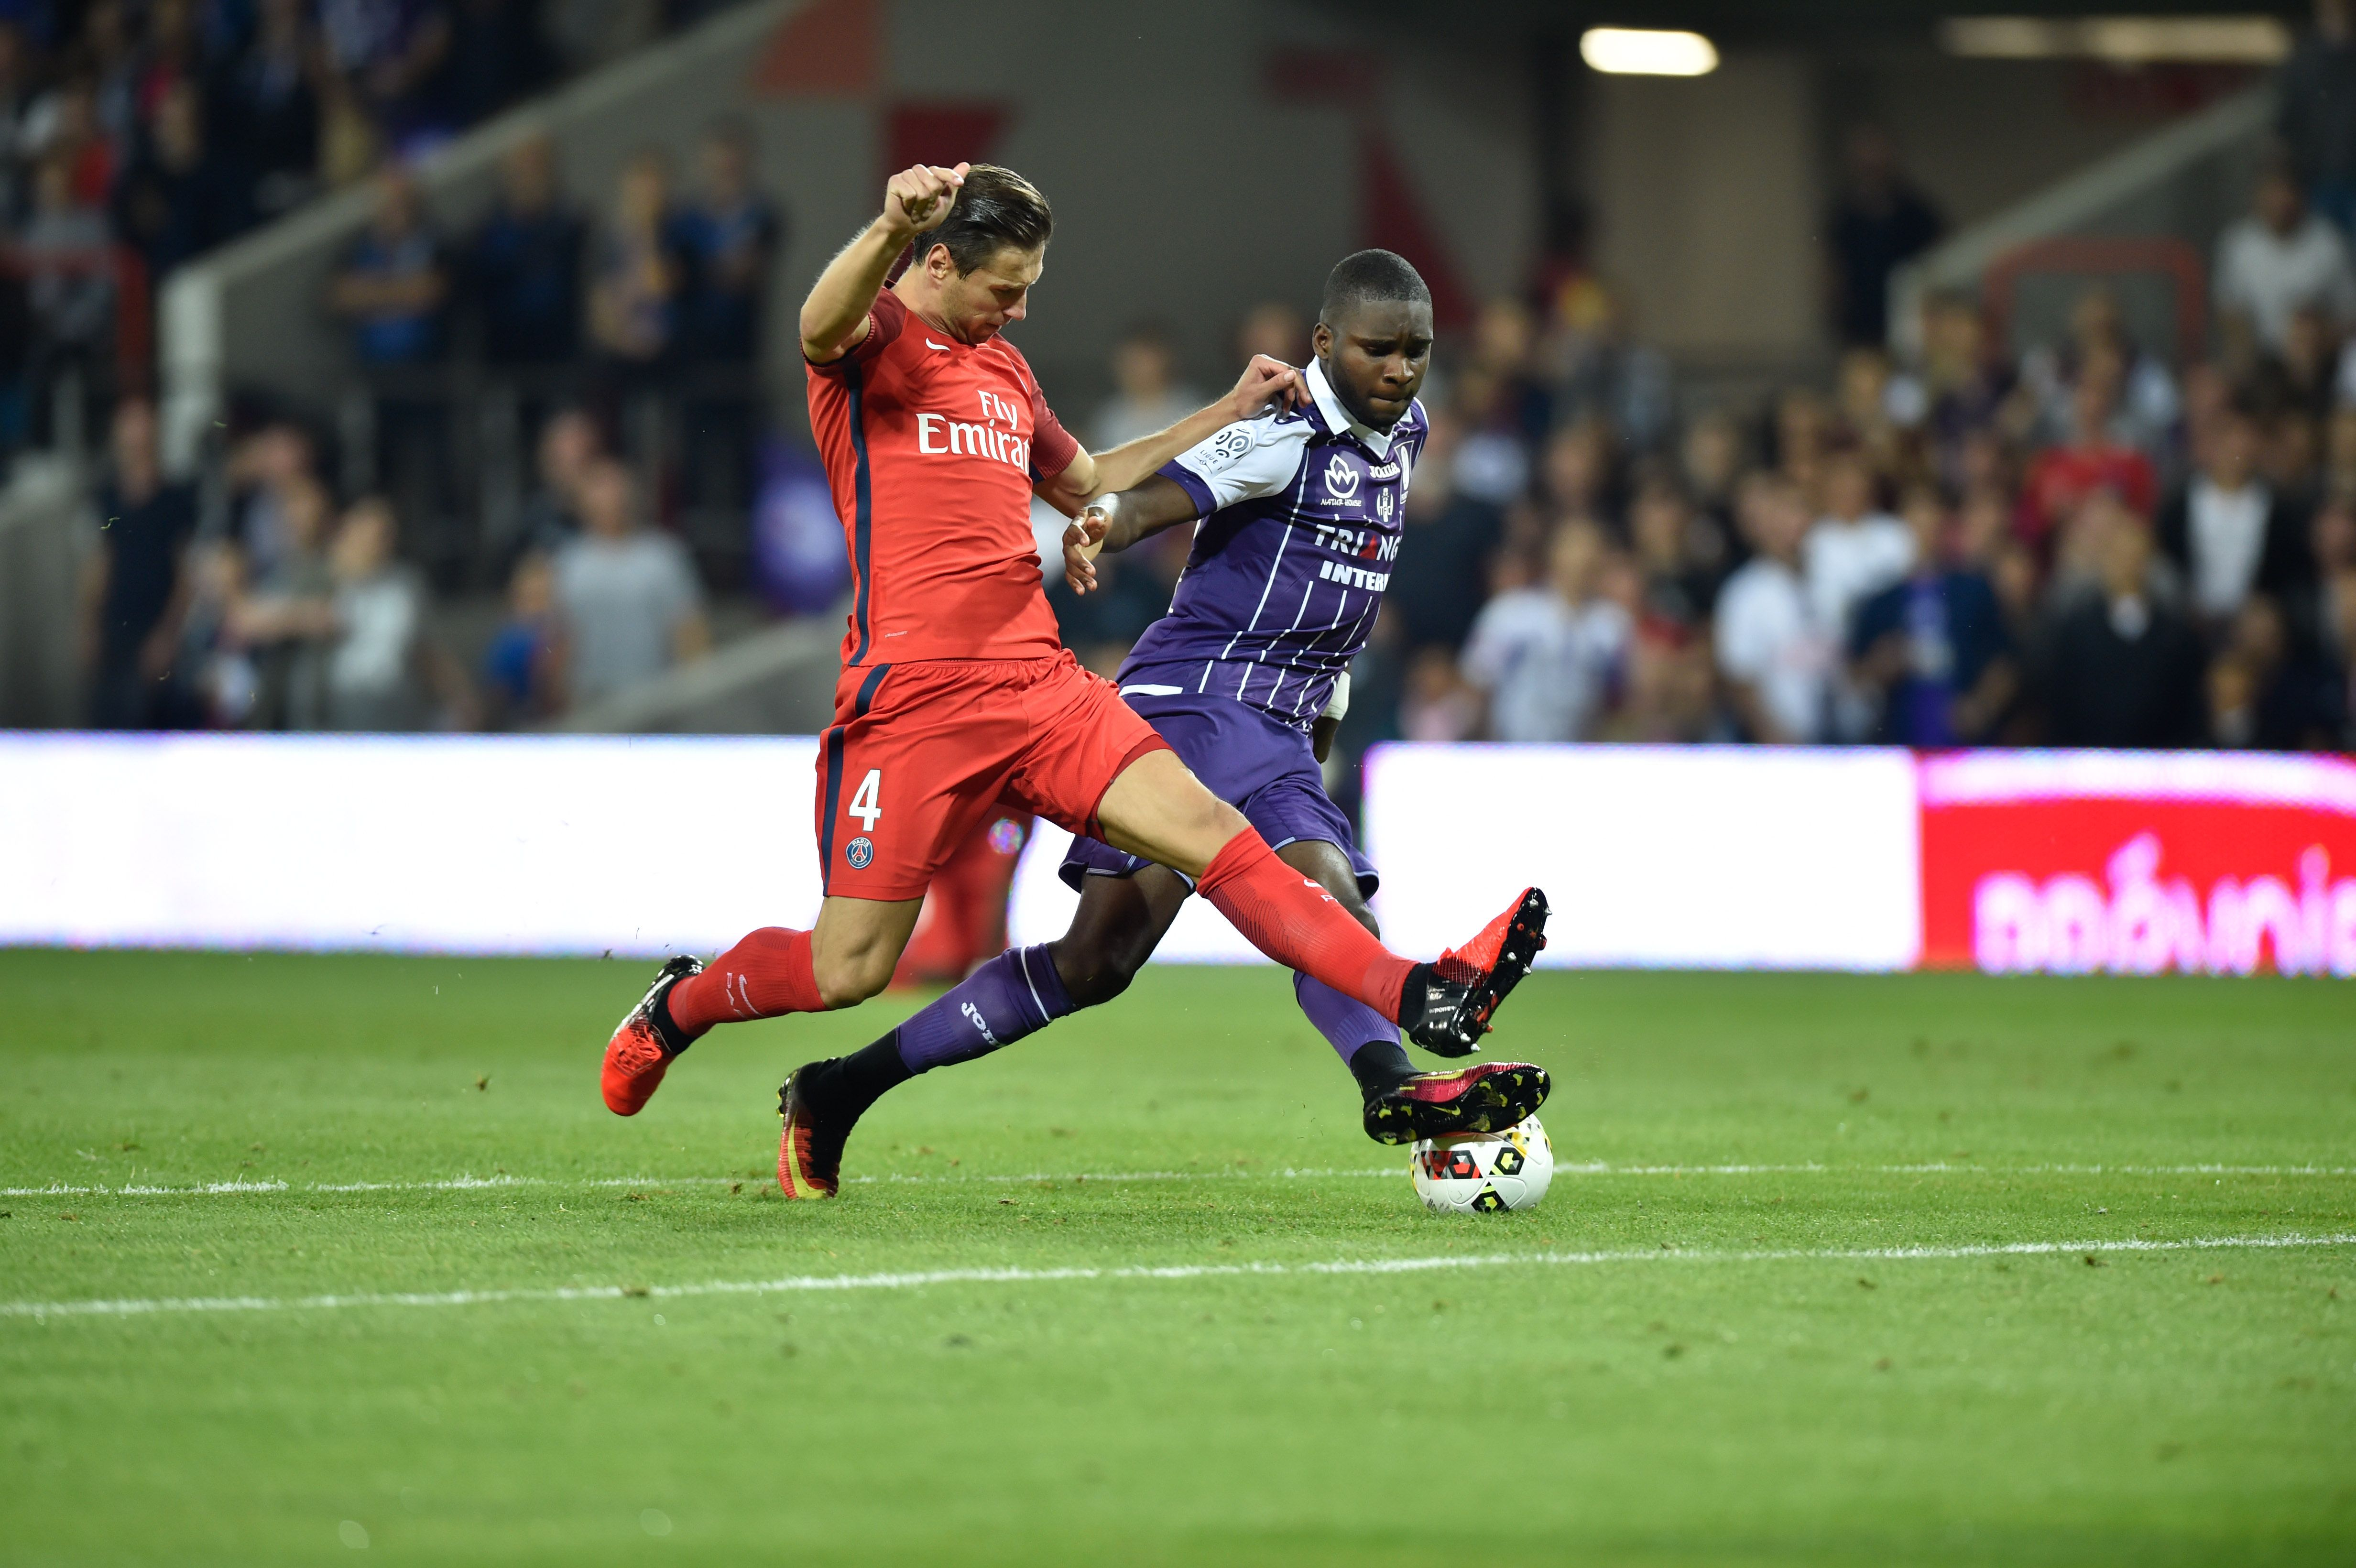 Football - Ligue des champions - PSG : des recrues estivales qui tardent à convaincre